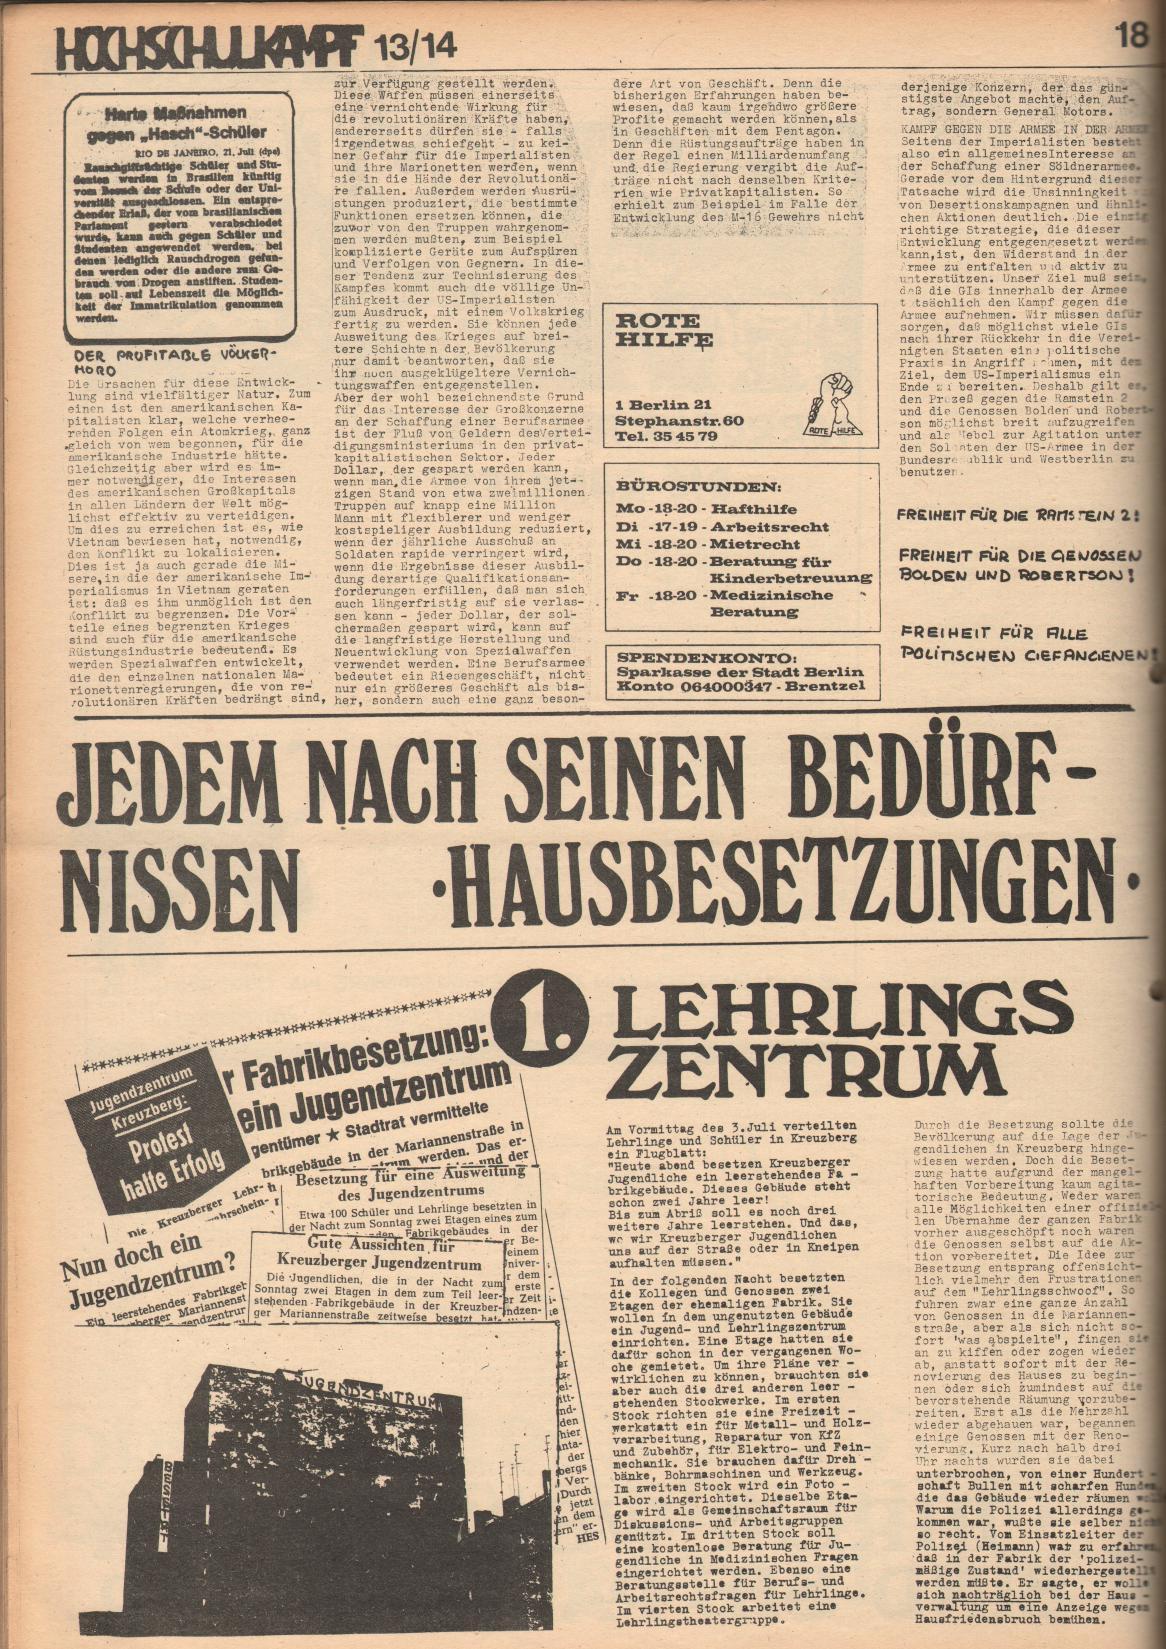 Berlin_Hochschulkampf_1971_13_18